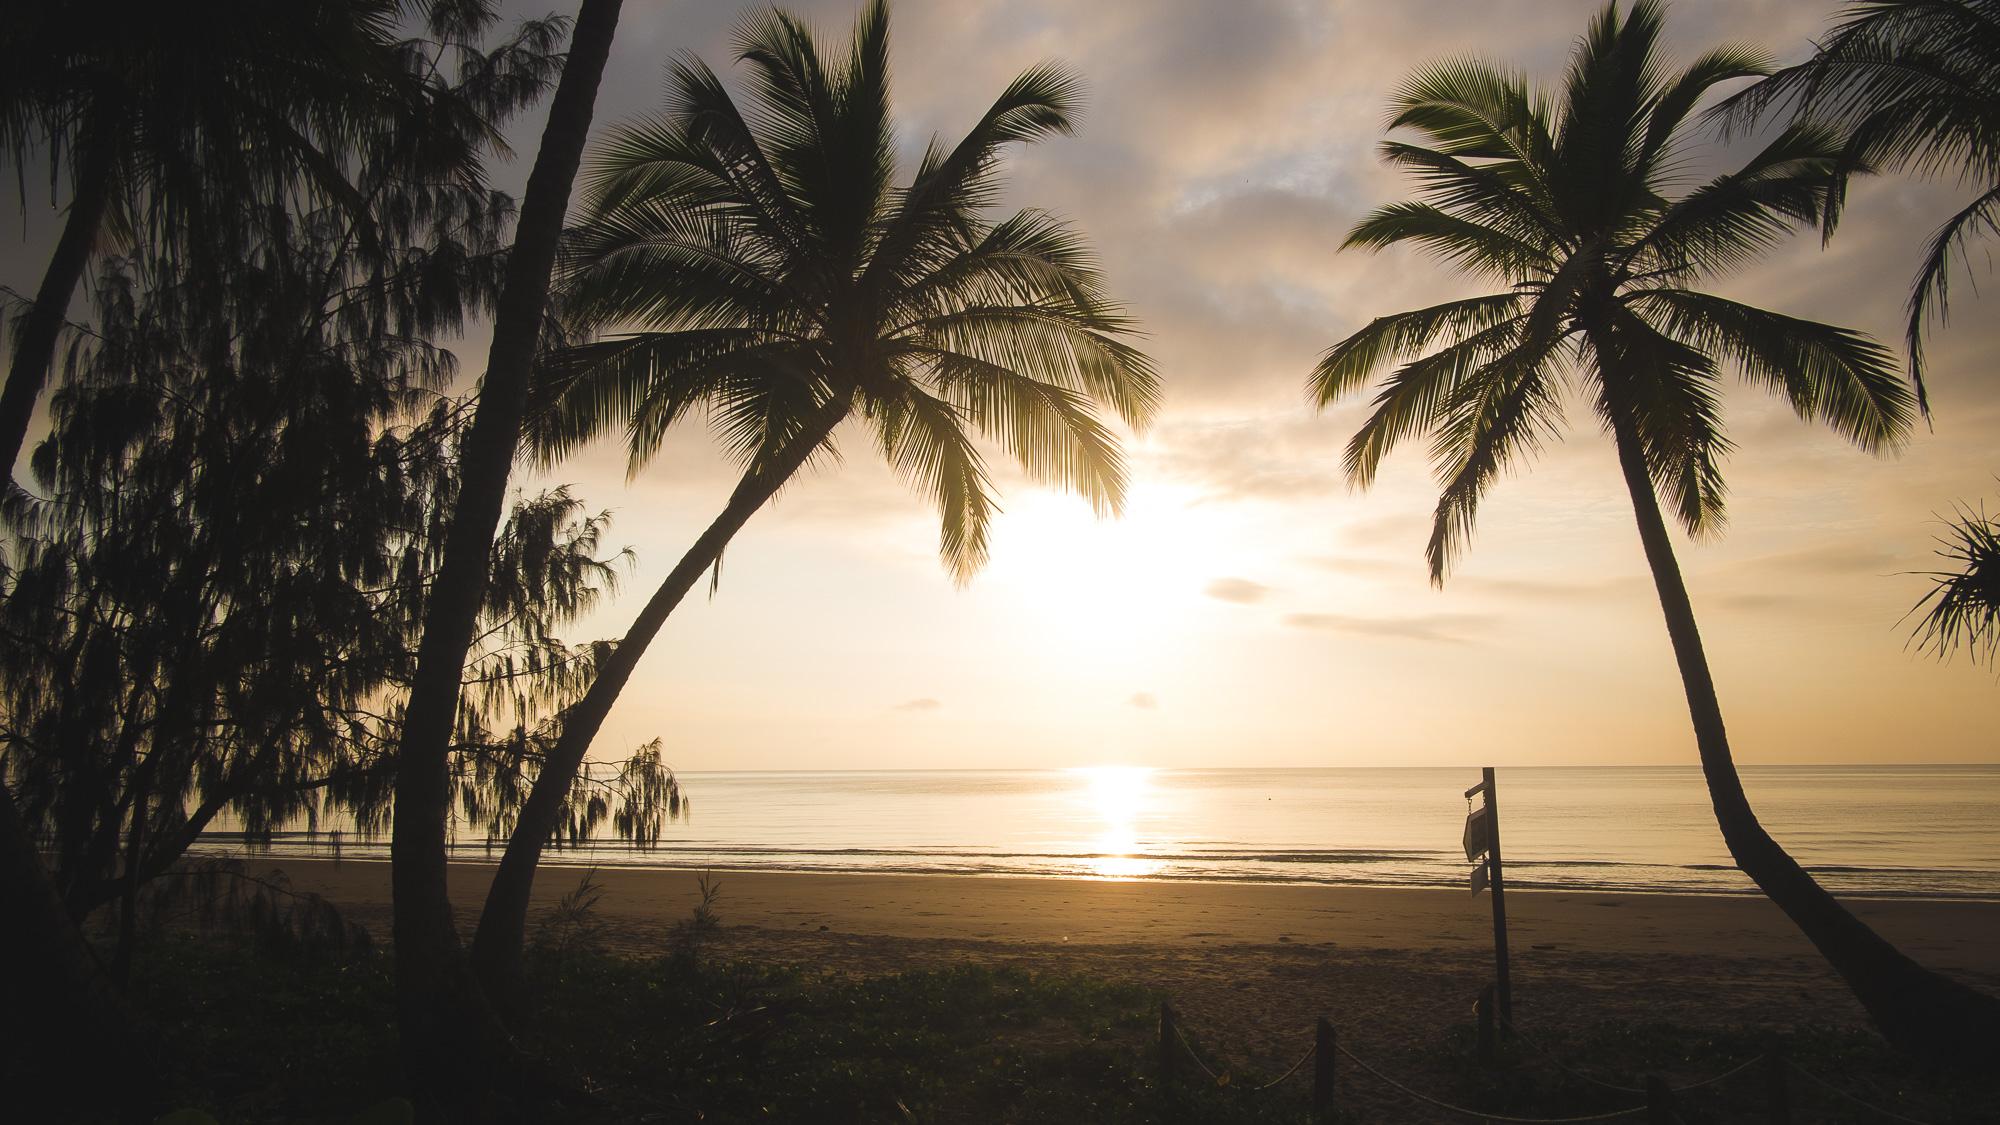 Sunrise at tropical Mission Beach, Castaways Resort, NSW